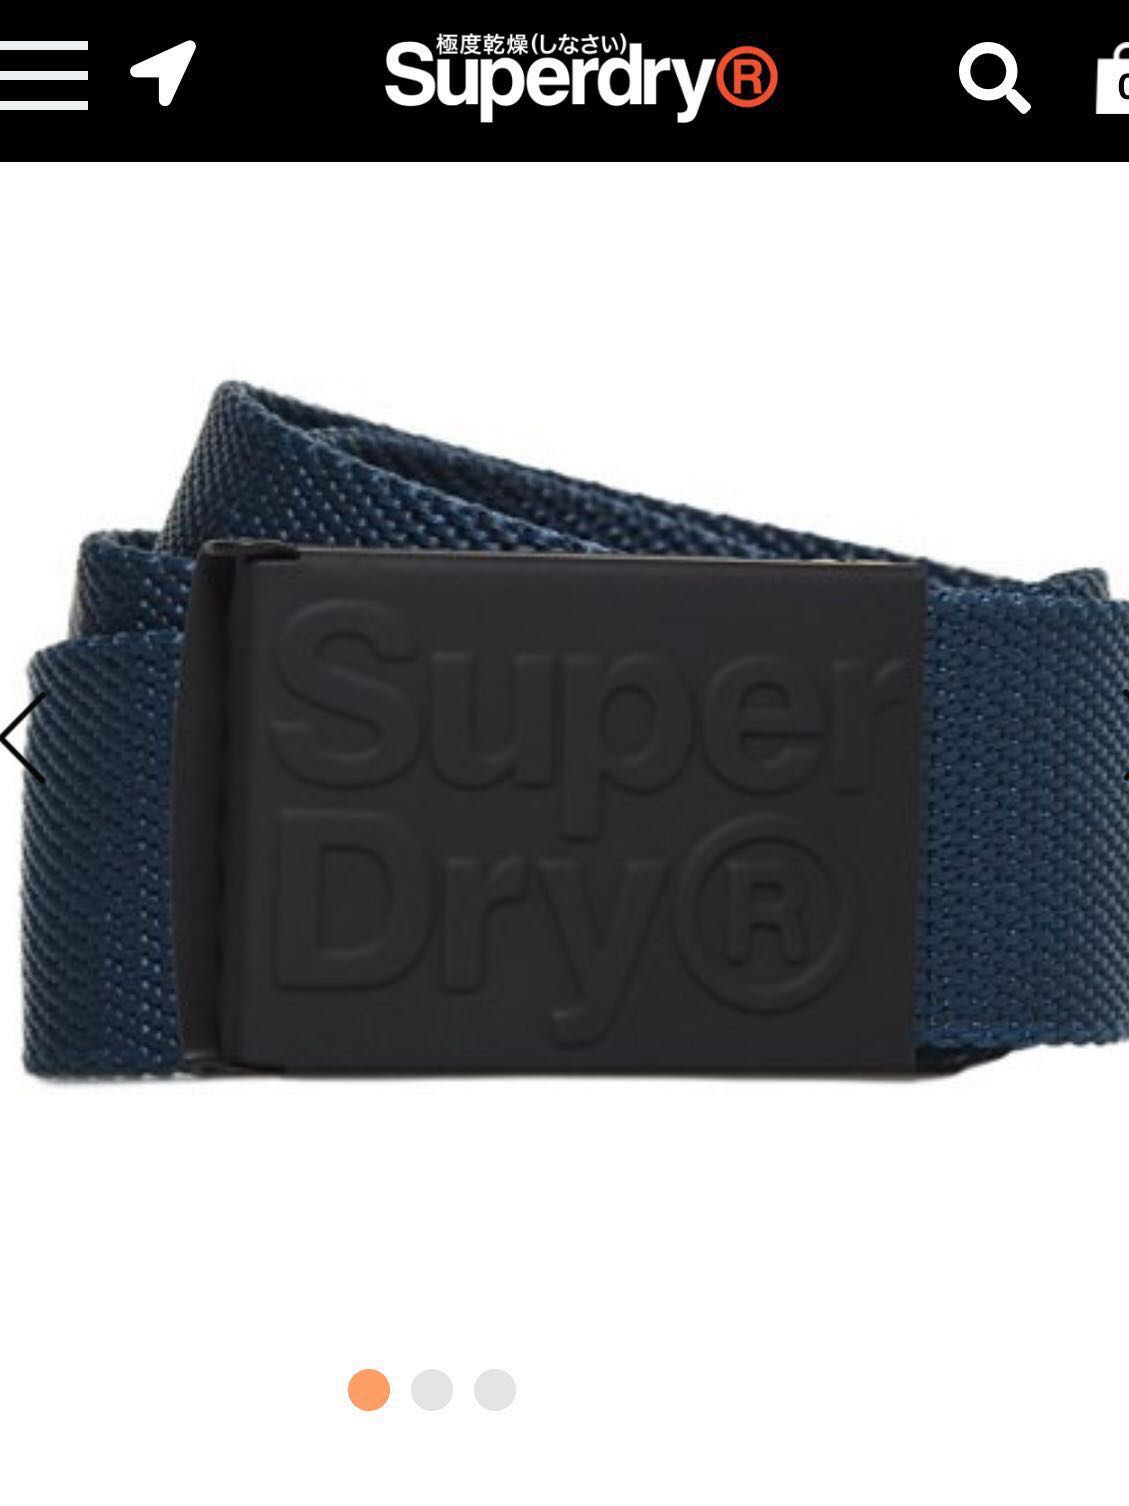 8db8fdc8915 SALE!!!! Authentic Superdry Belt